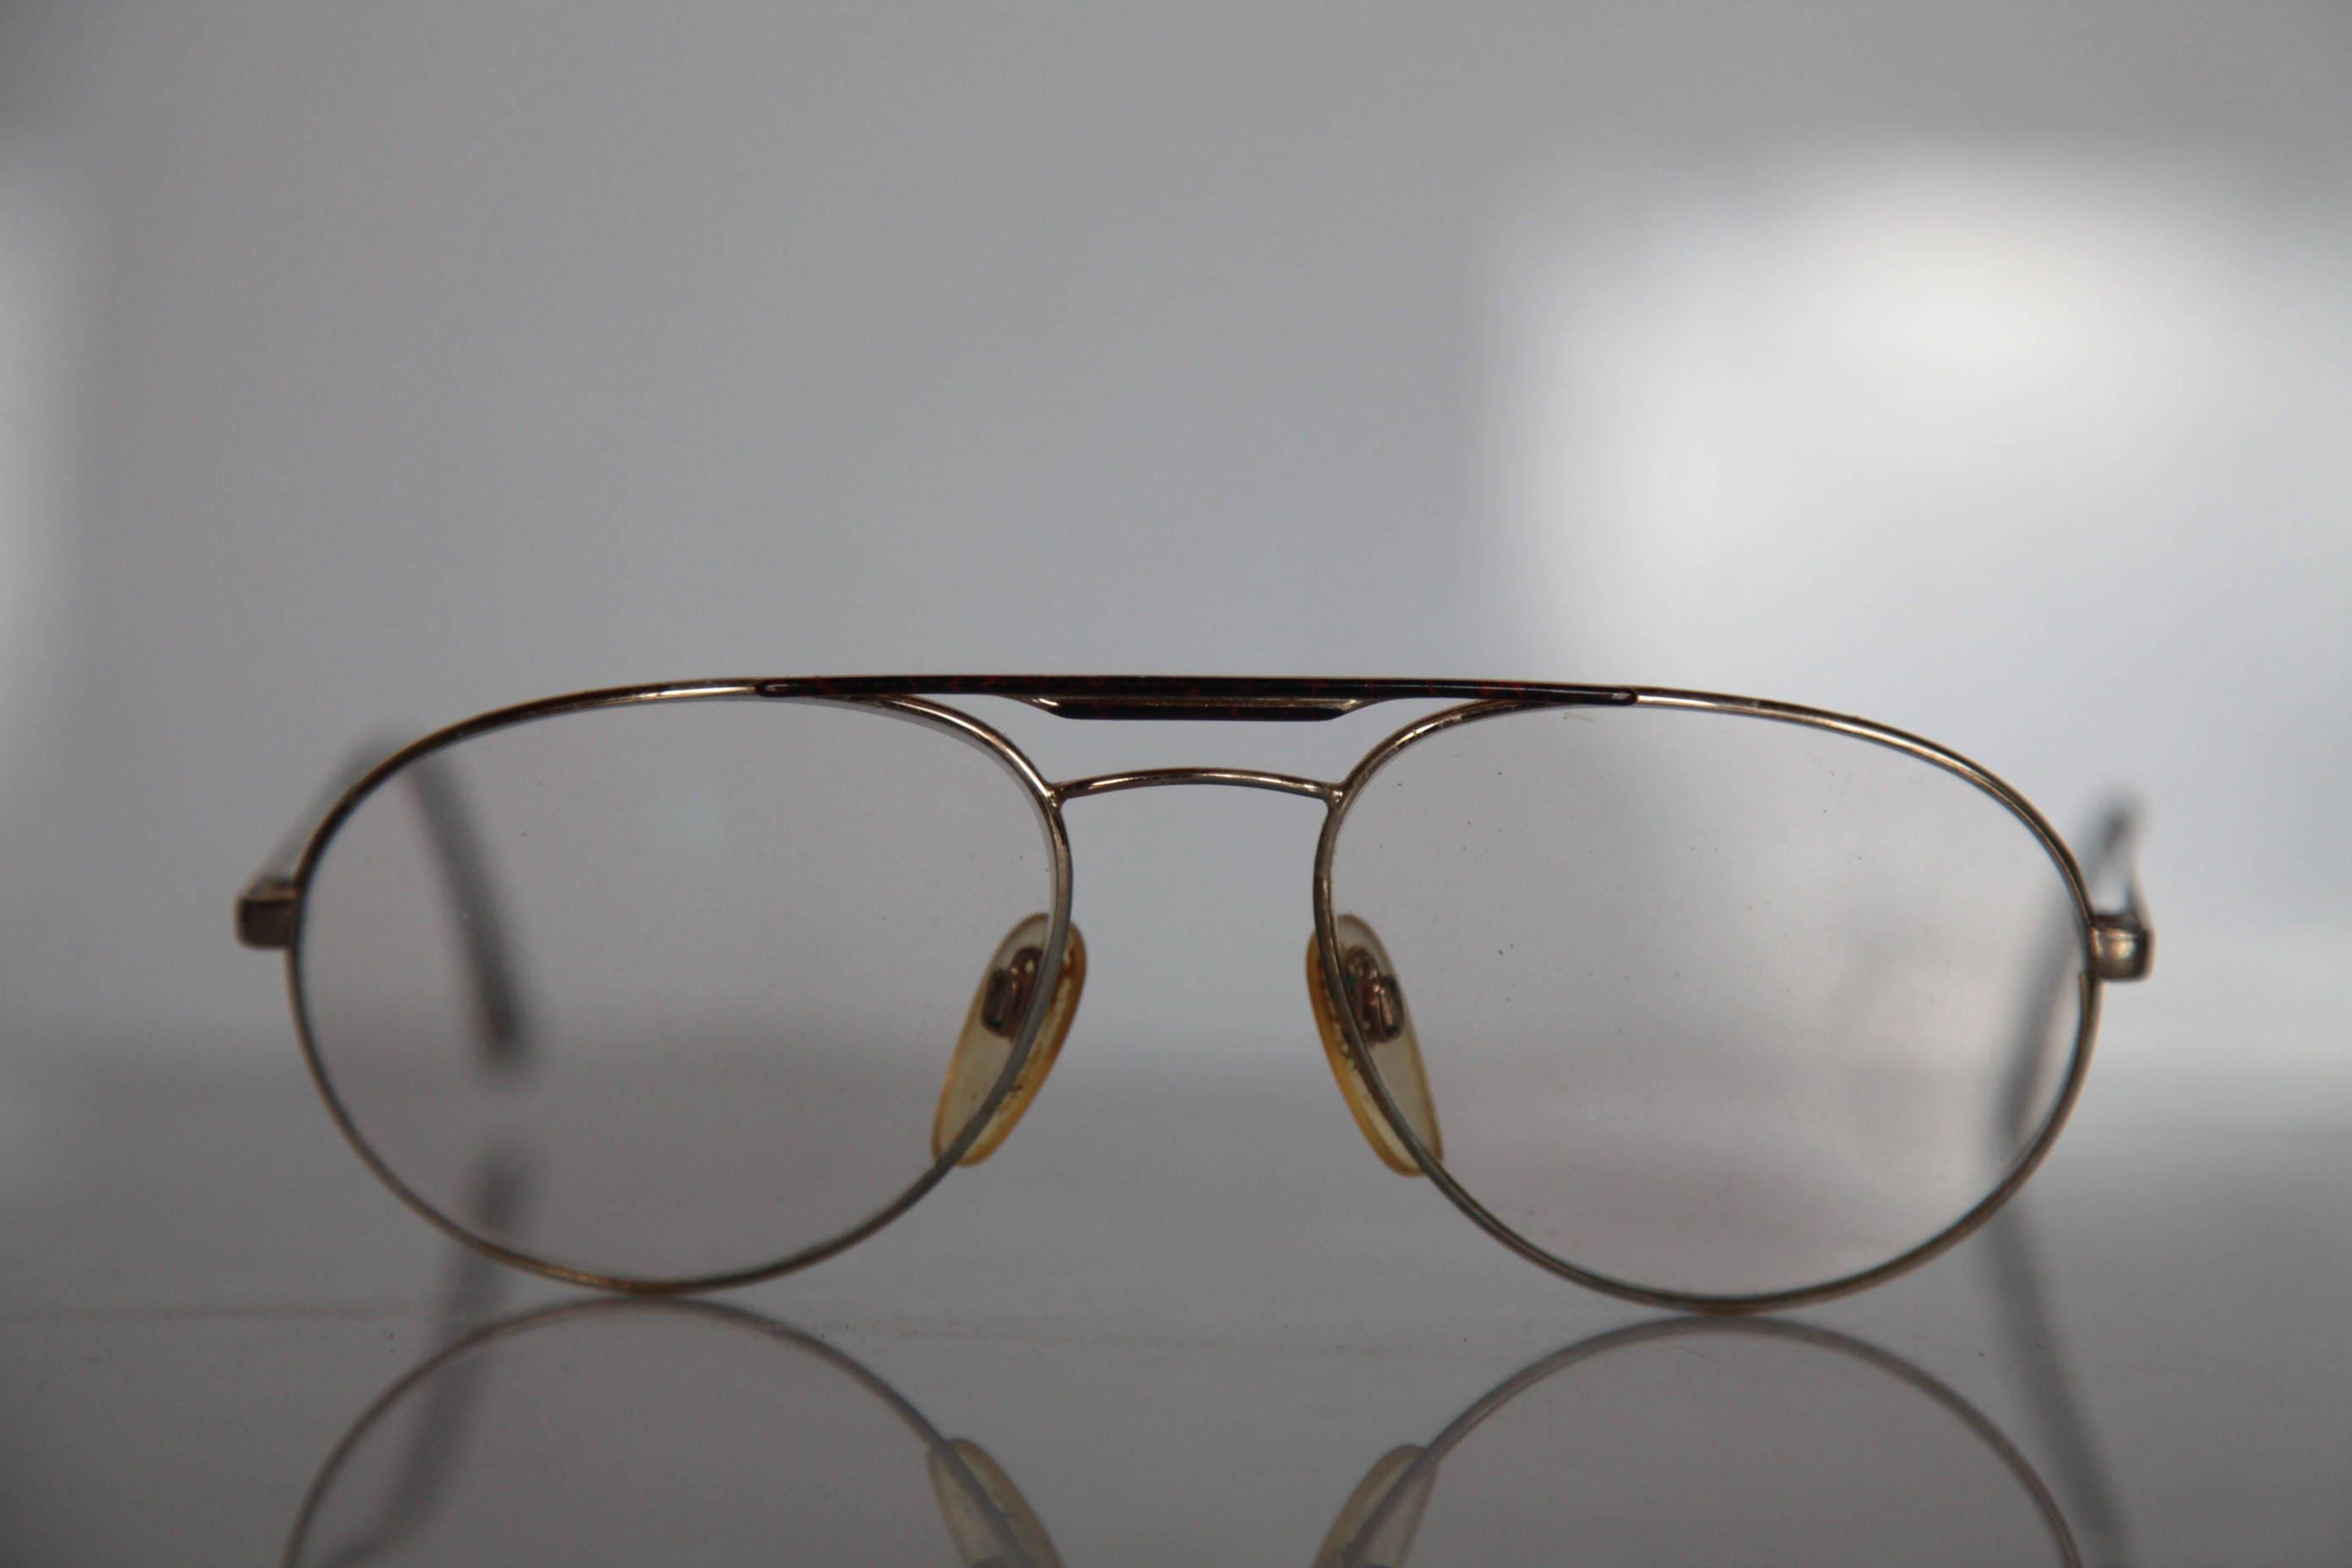 Vintage RODENSTOCK SASCHA Eyewear, Gold Aviator Frame, Rx-Able ...